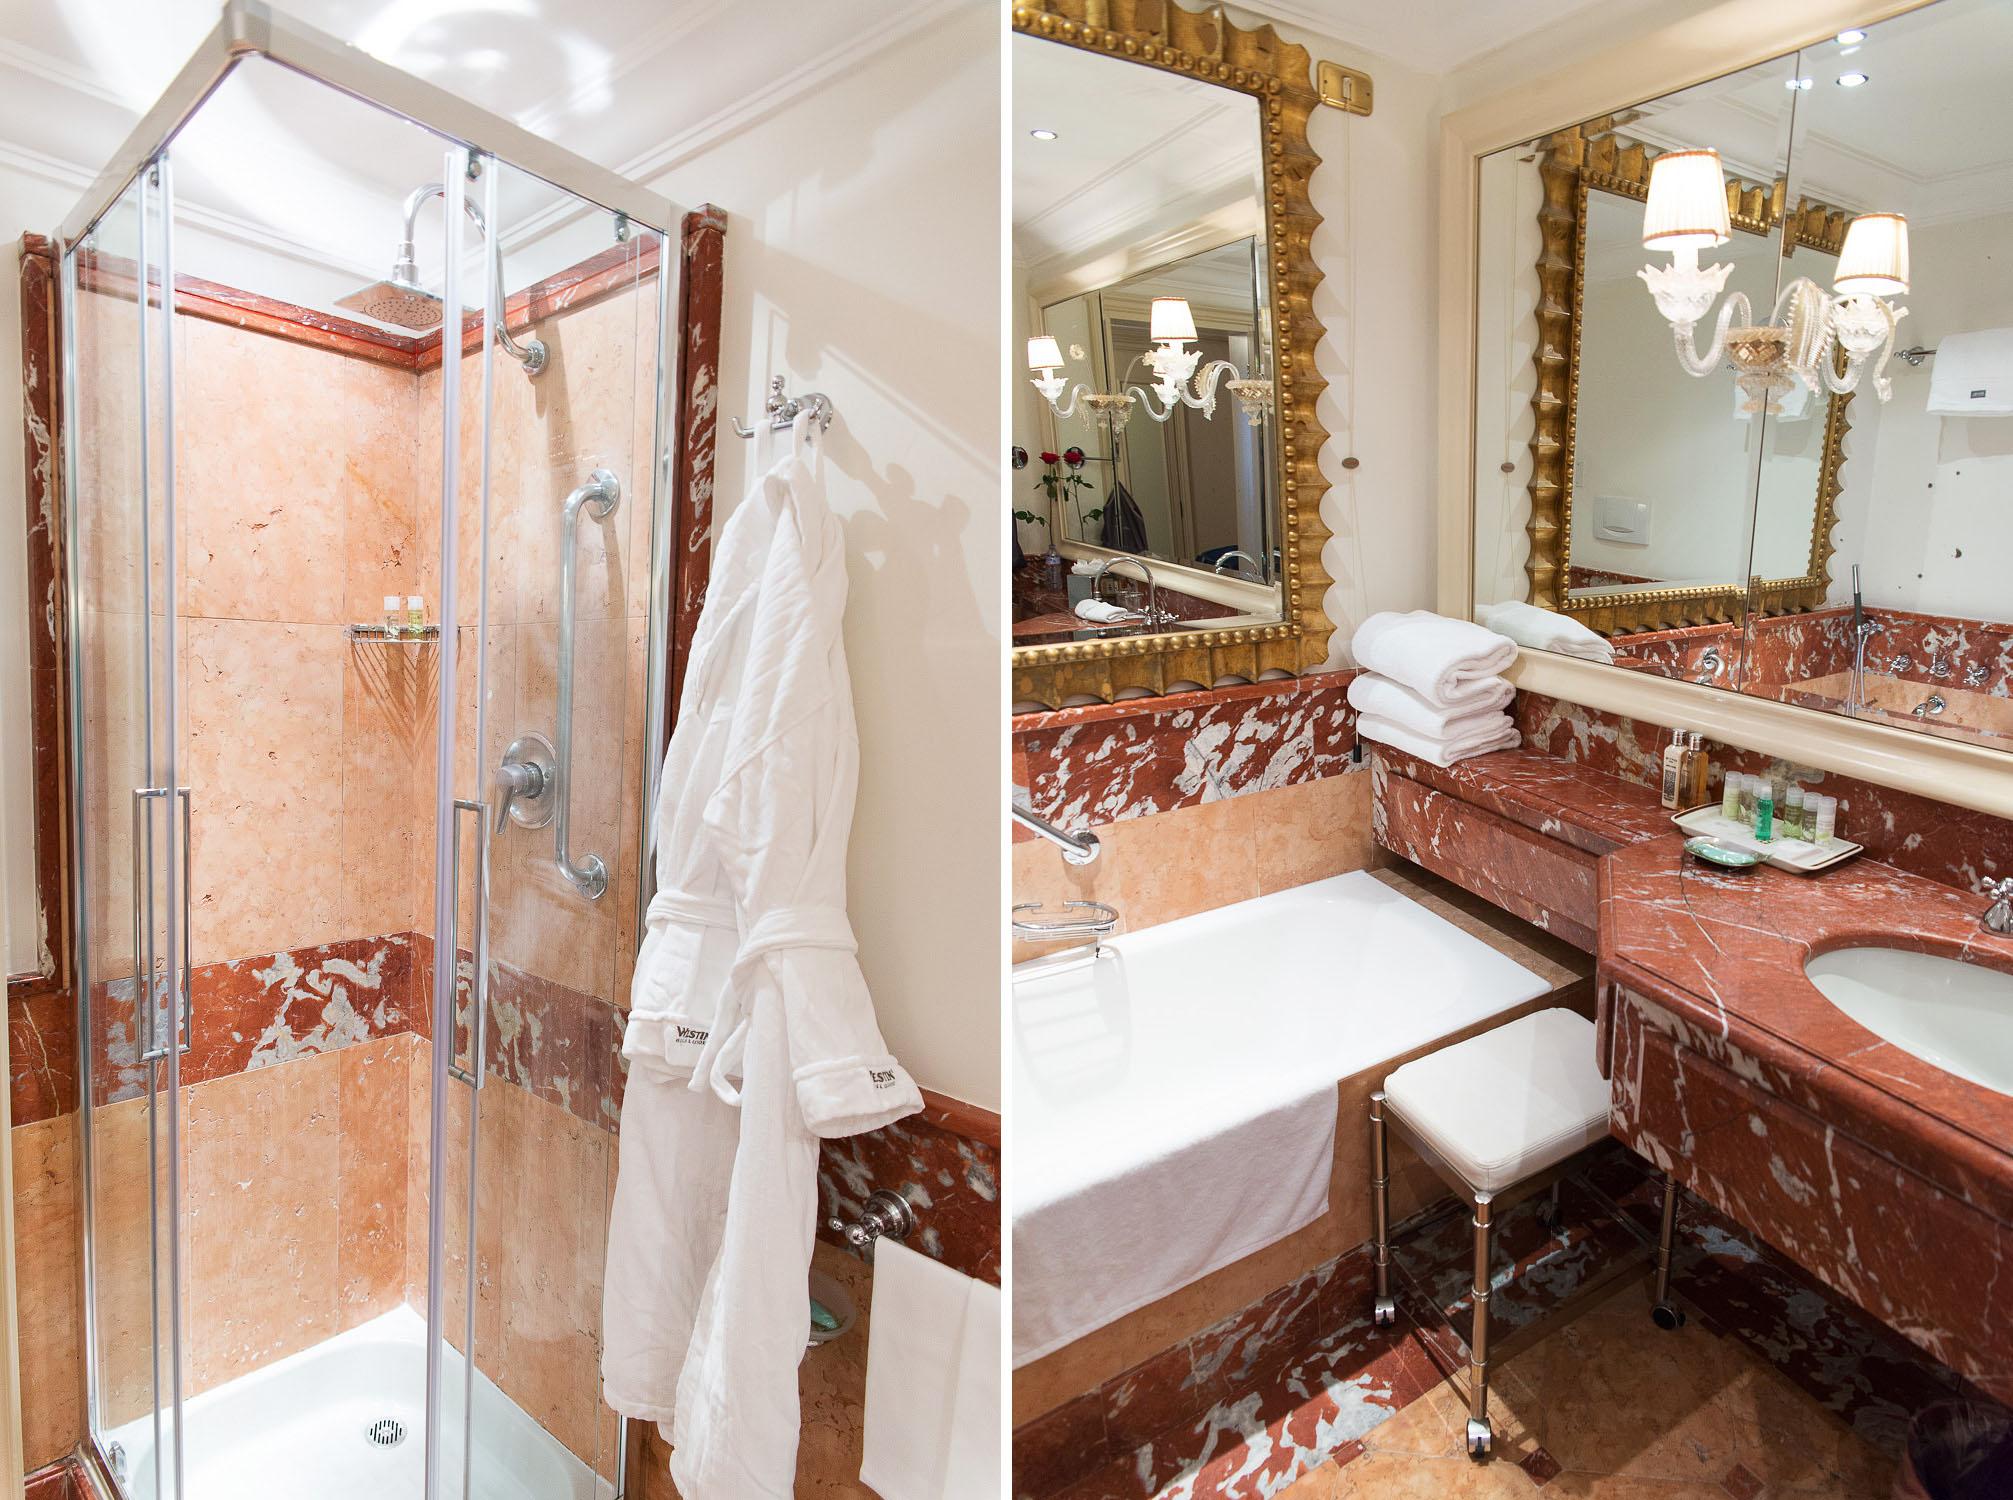 Westin Hotels & Resorts - Westin Europa and Regina in Venice